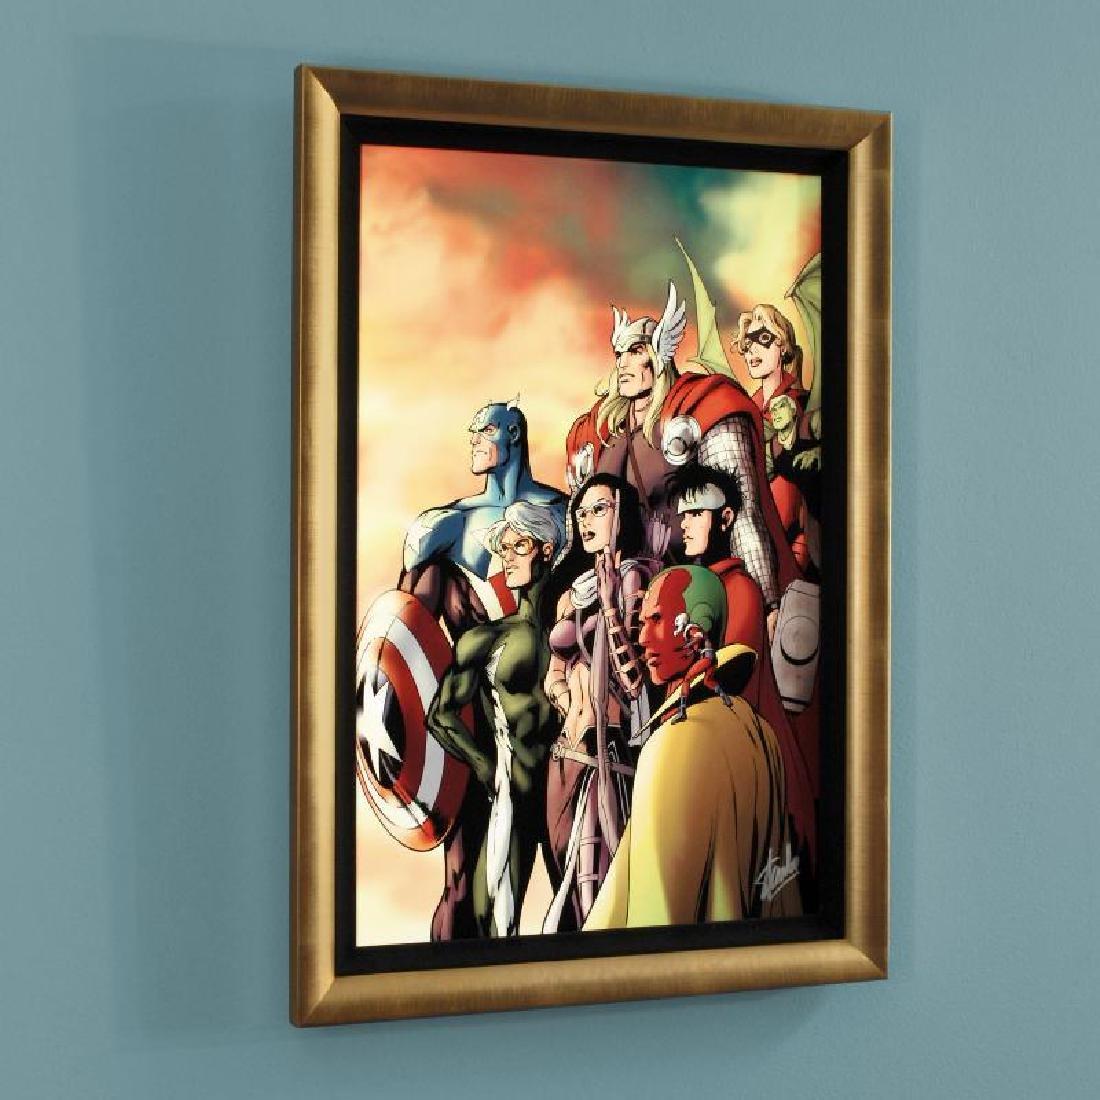 I Am an Avenger #5 by Stan Lee - Marvel Comics - 2